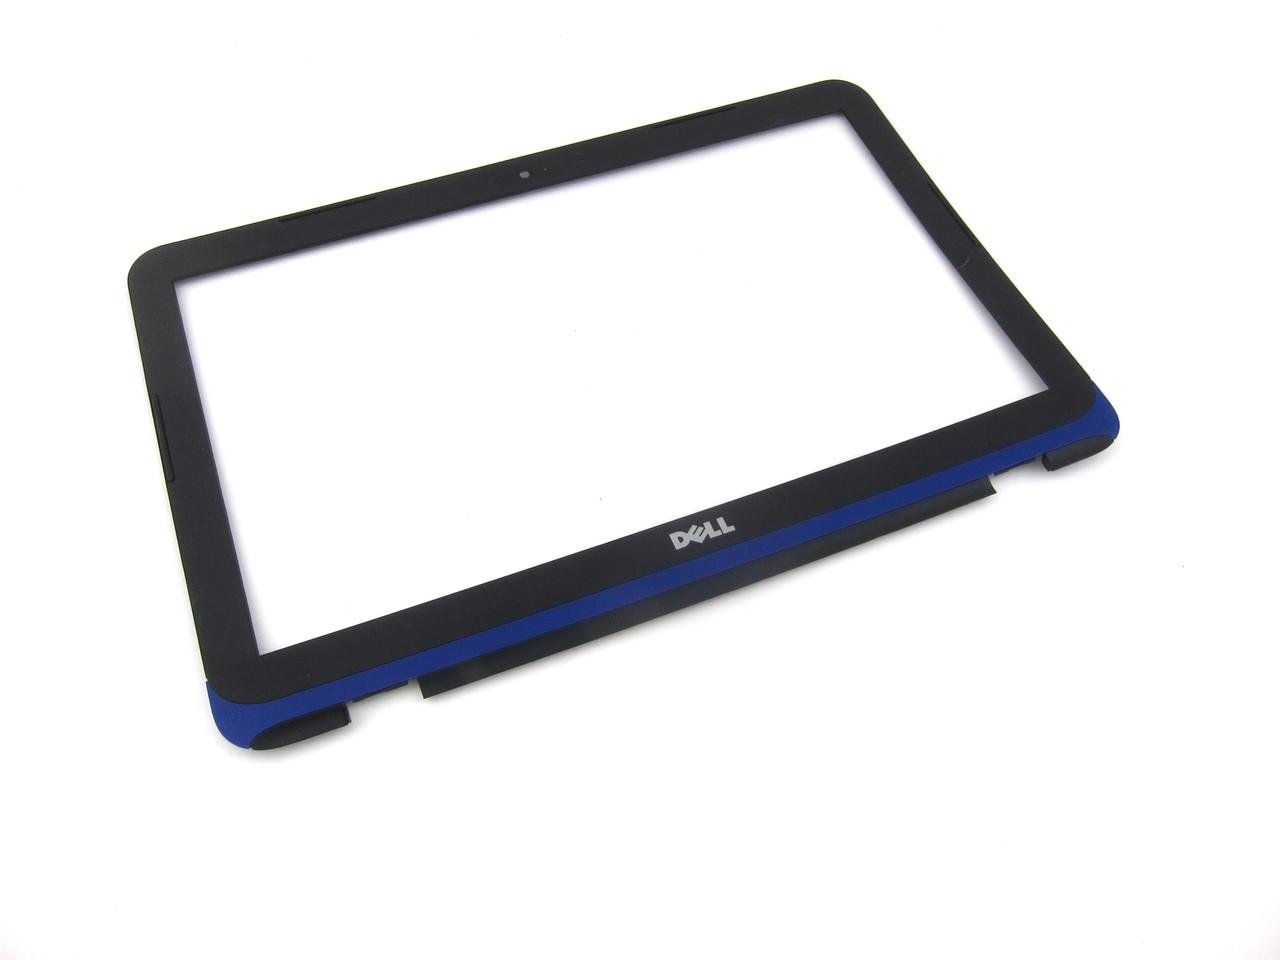 "Dell Inspiron 11 3162 / 3164 11.6"" Front LCD Bezel -  7H0YC"